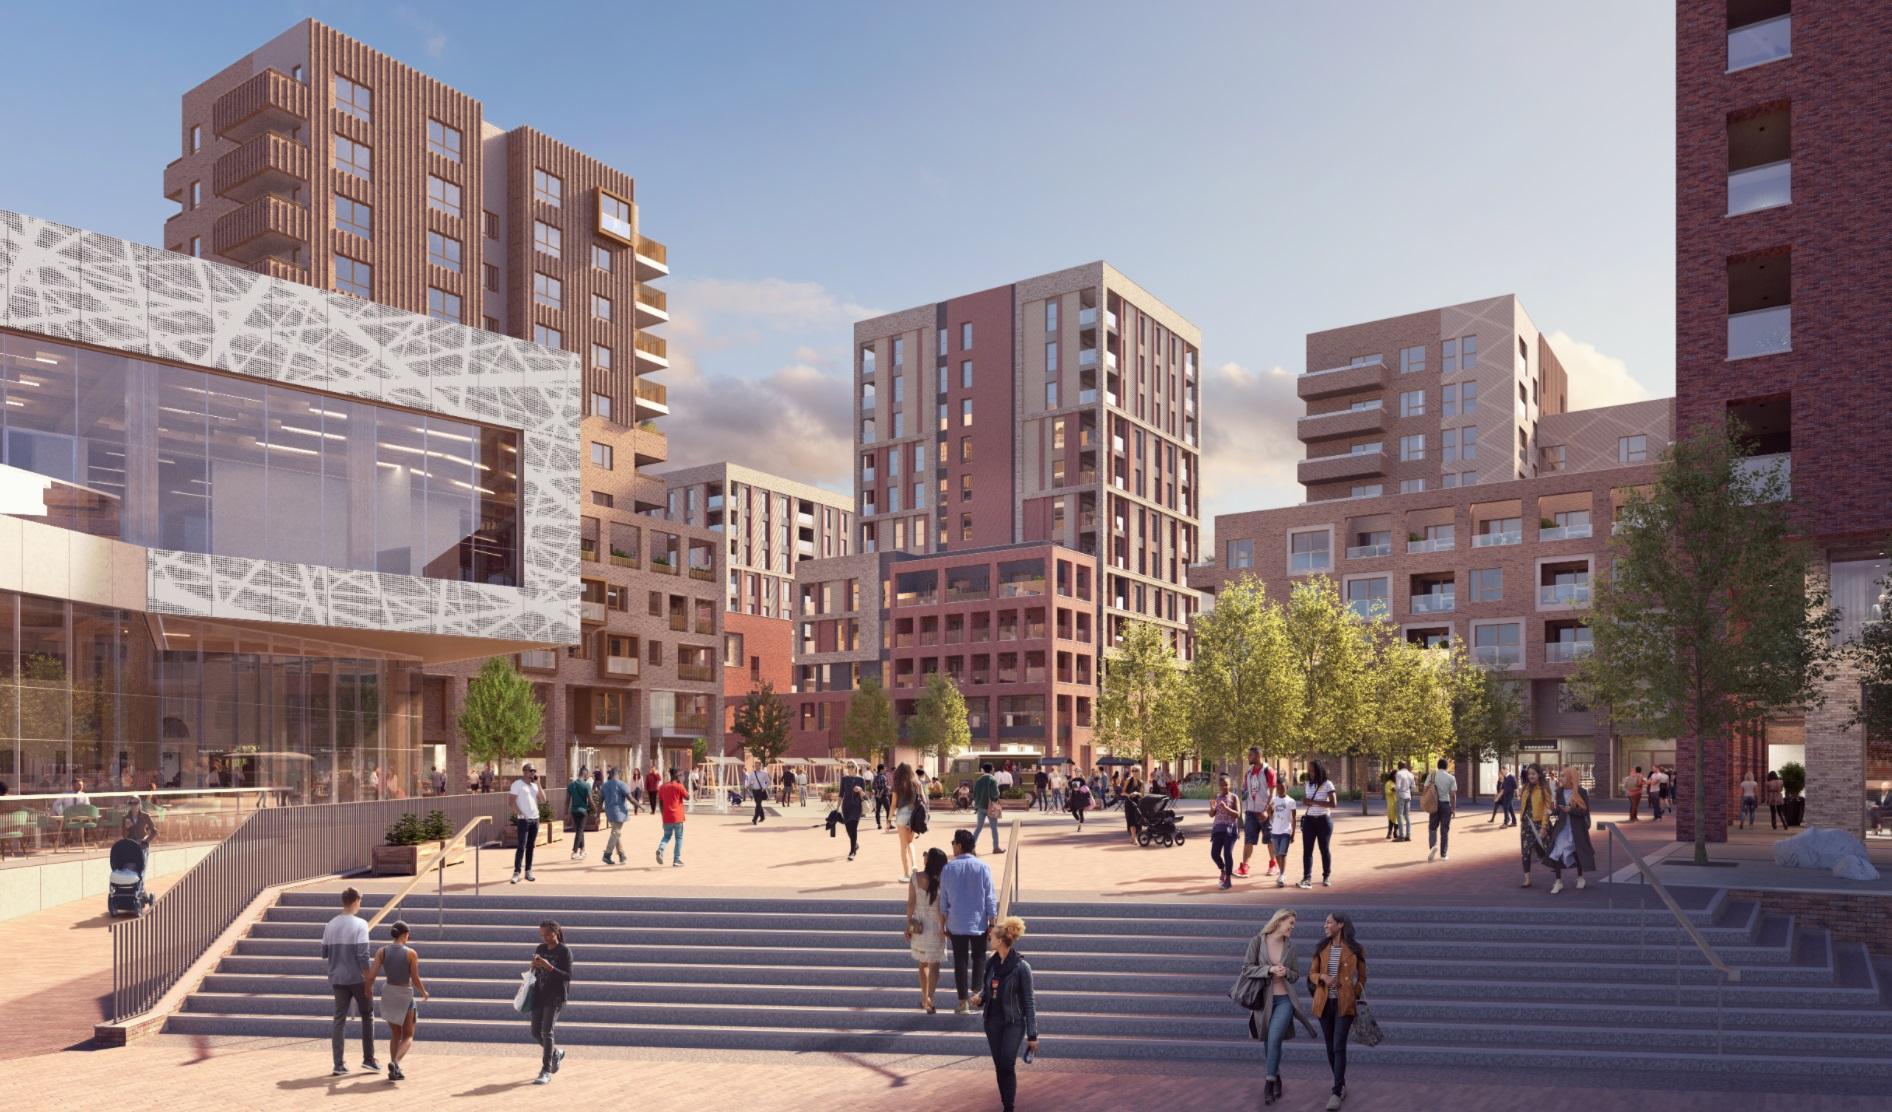 Flagship Thamesmead estate rebuild sees design cuts